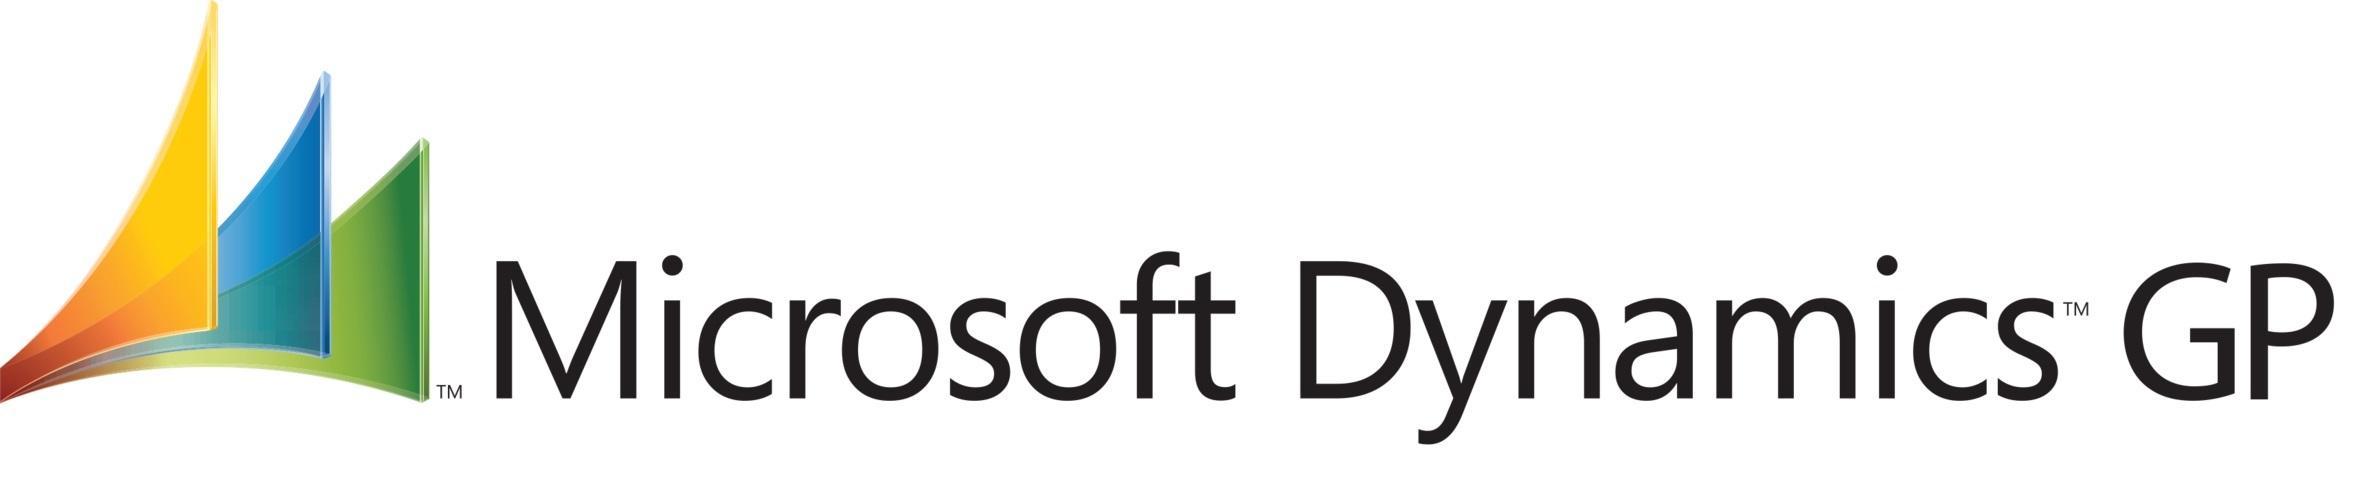 Microsoft Dynamics GP Logo